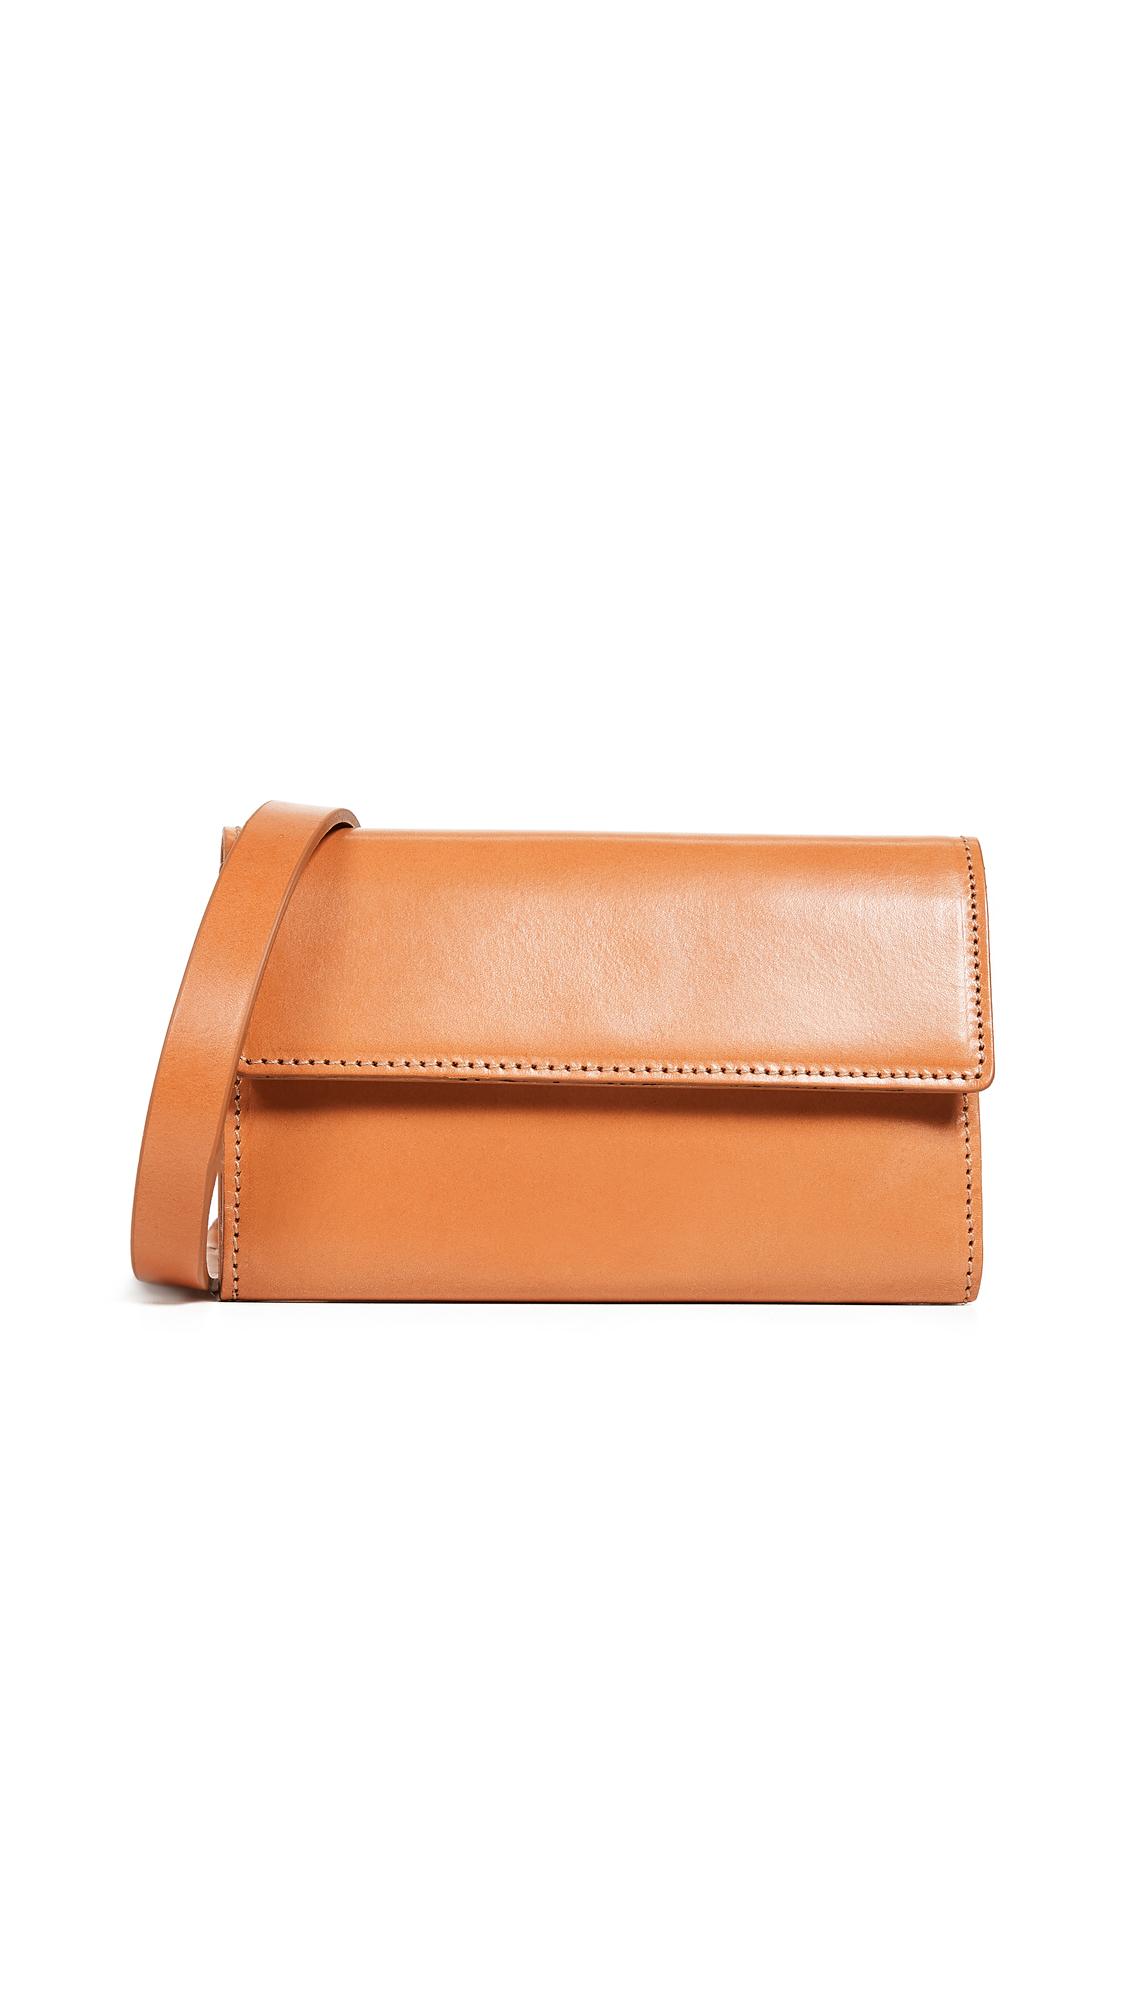 VEREVERTO Ado Convertible Belt Bag in Honey